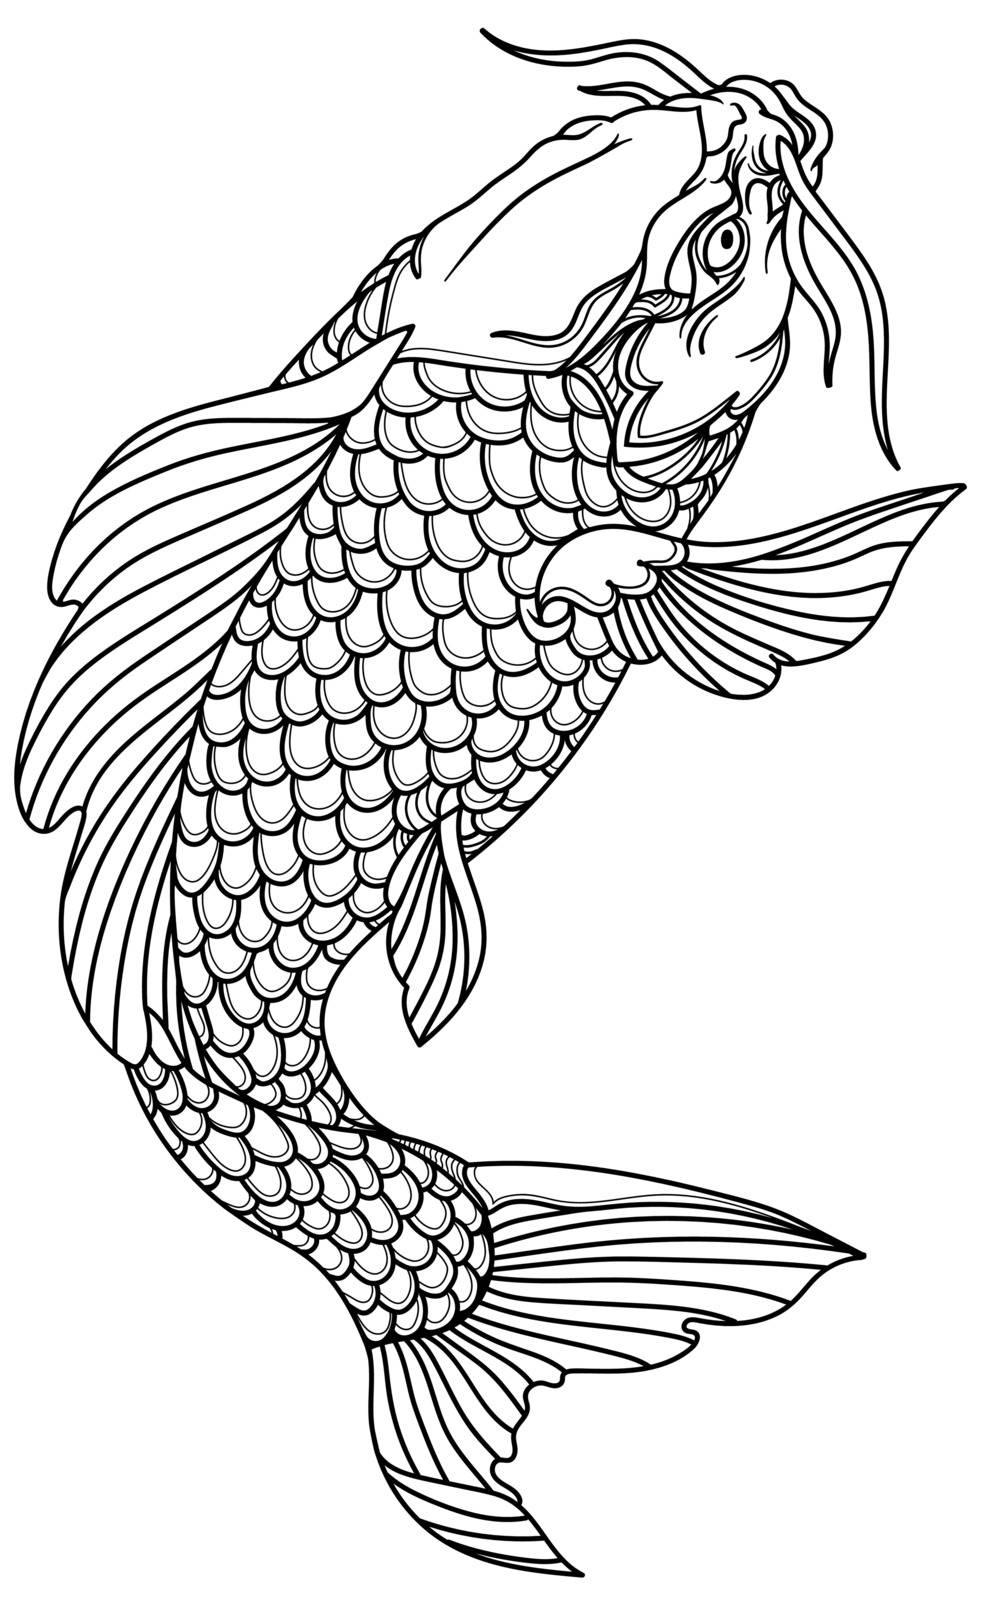 koi carp fish swimming up. Outline Tattoo. Isolated vector illustration